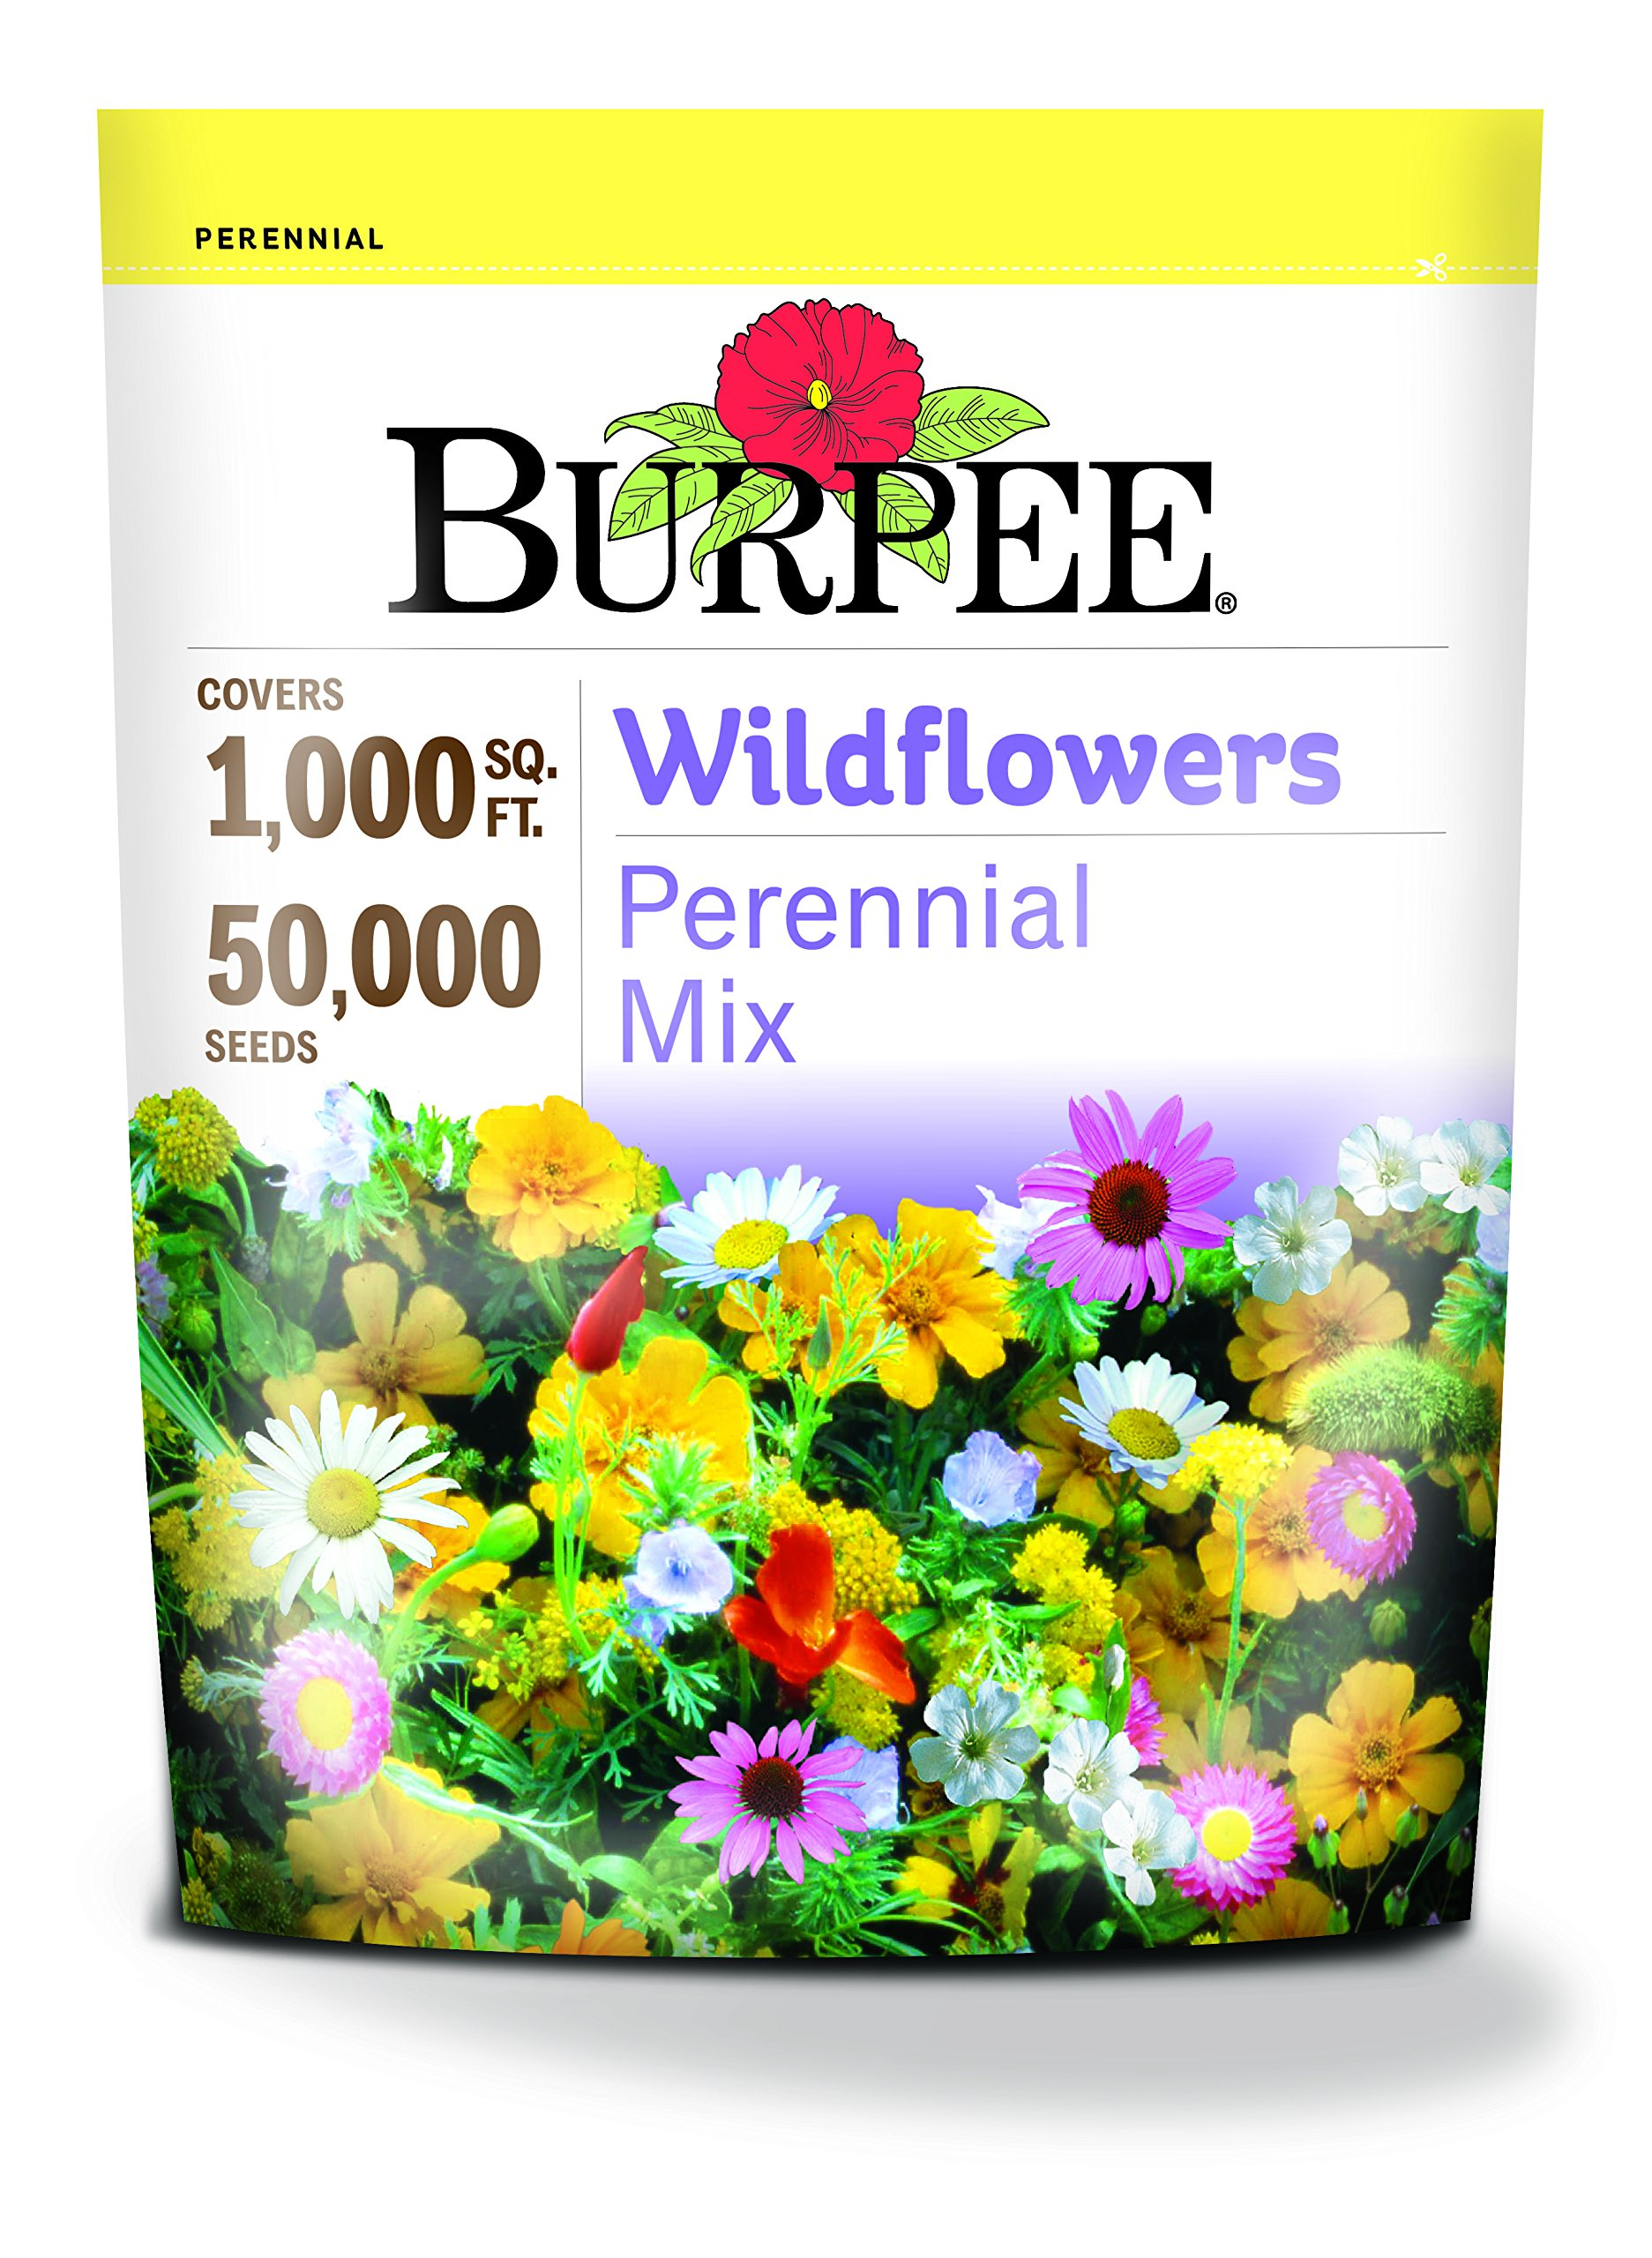 Burpee Perennial Wildflower Seed Mix